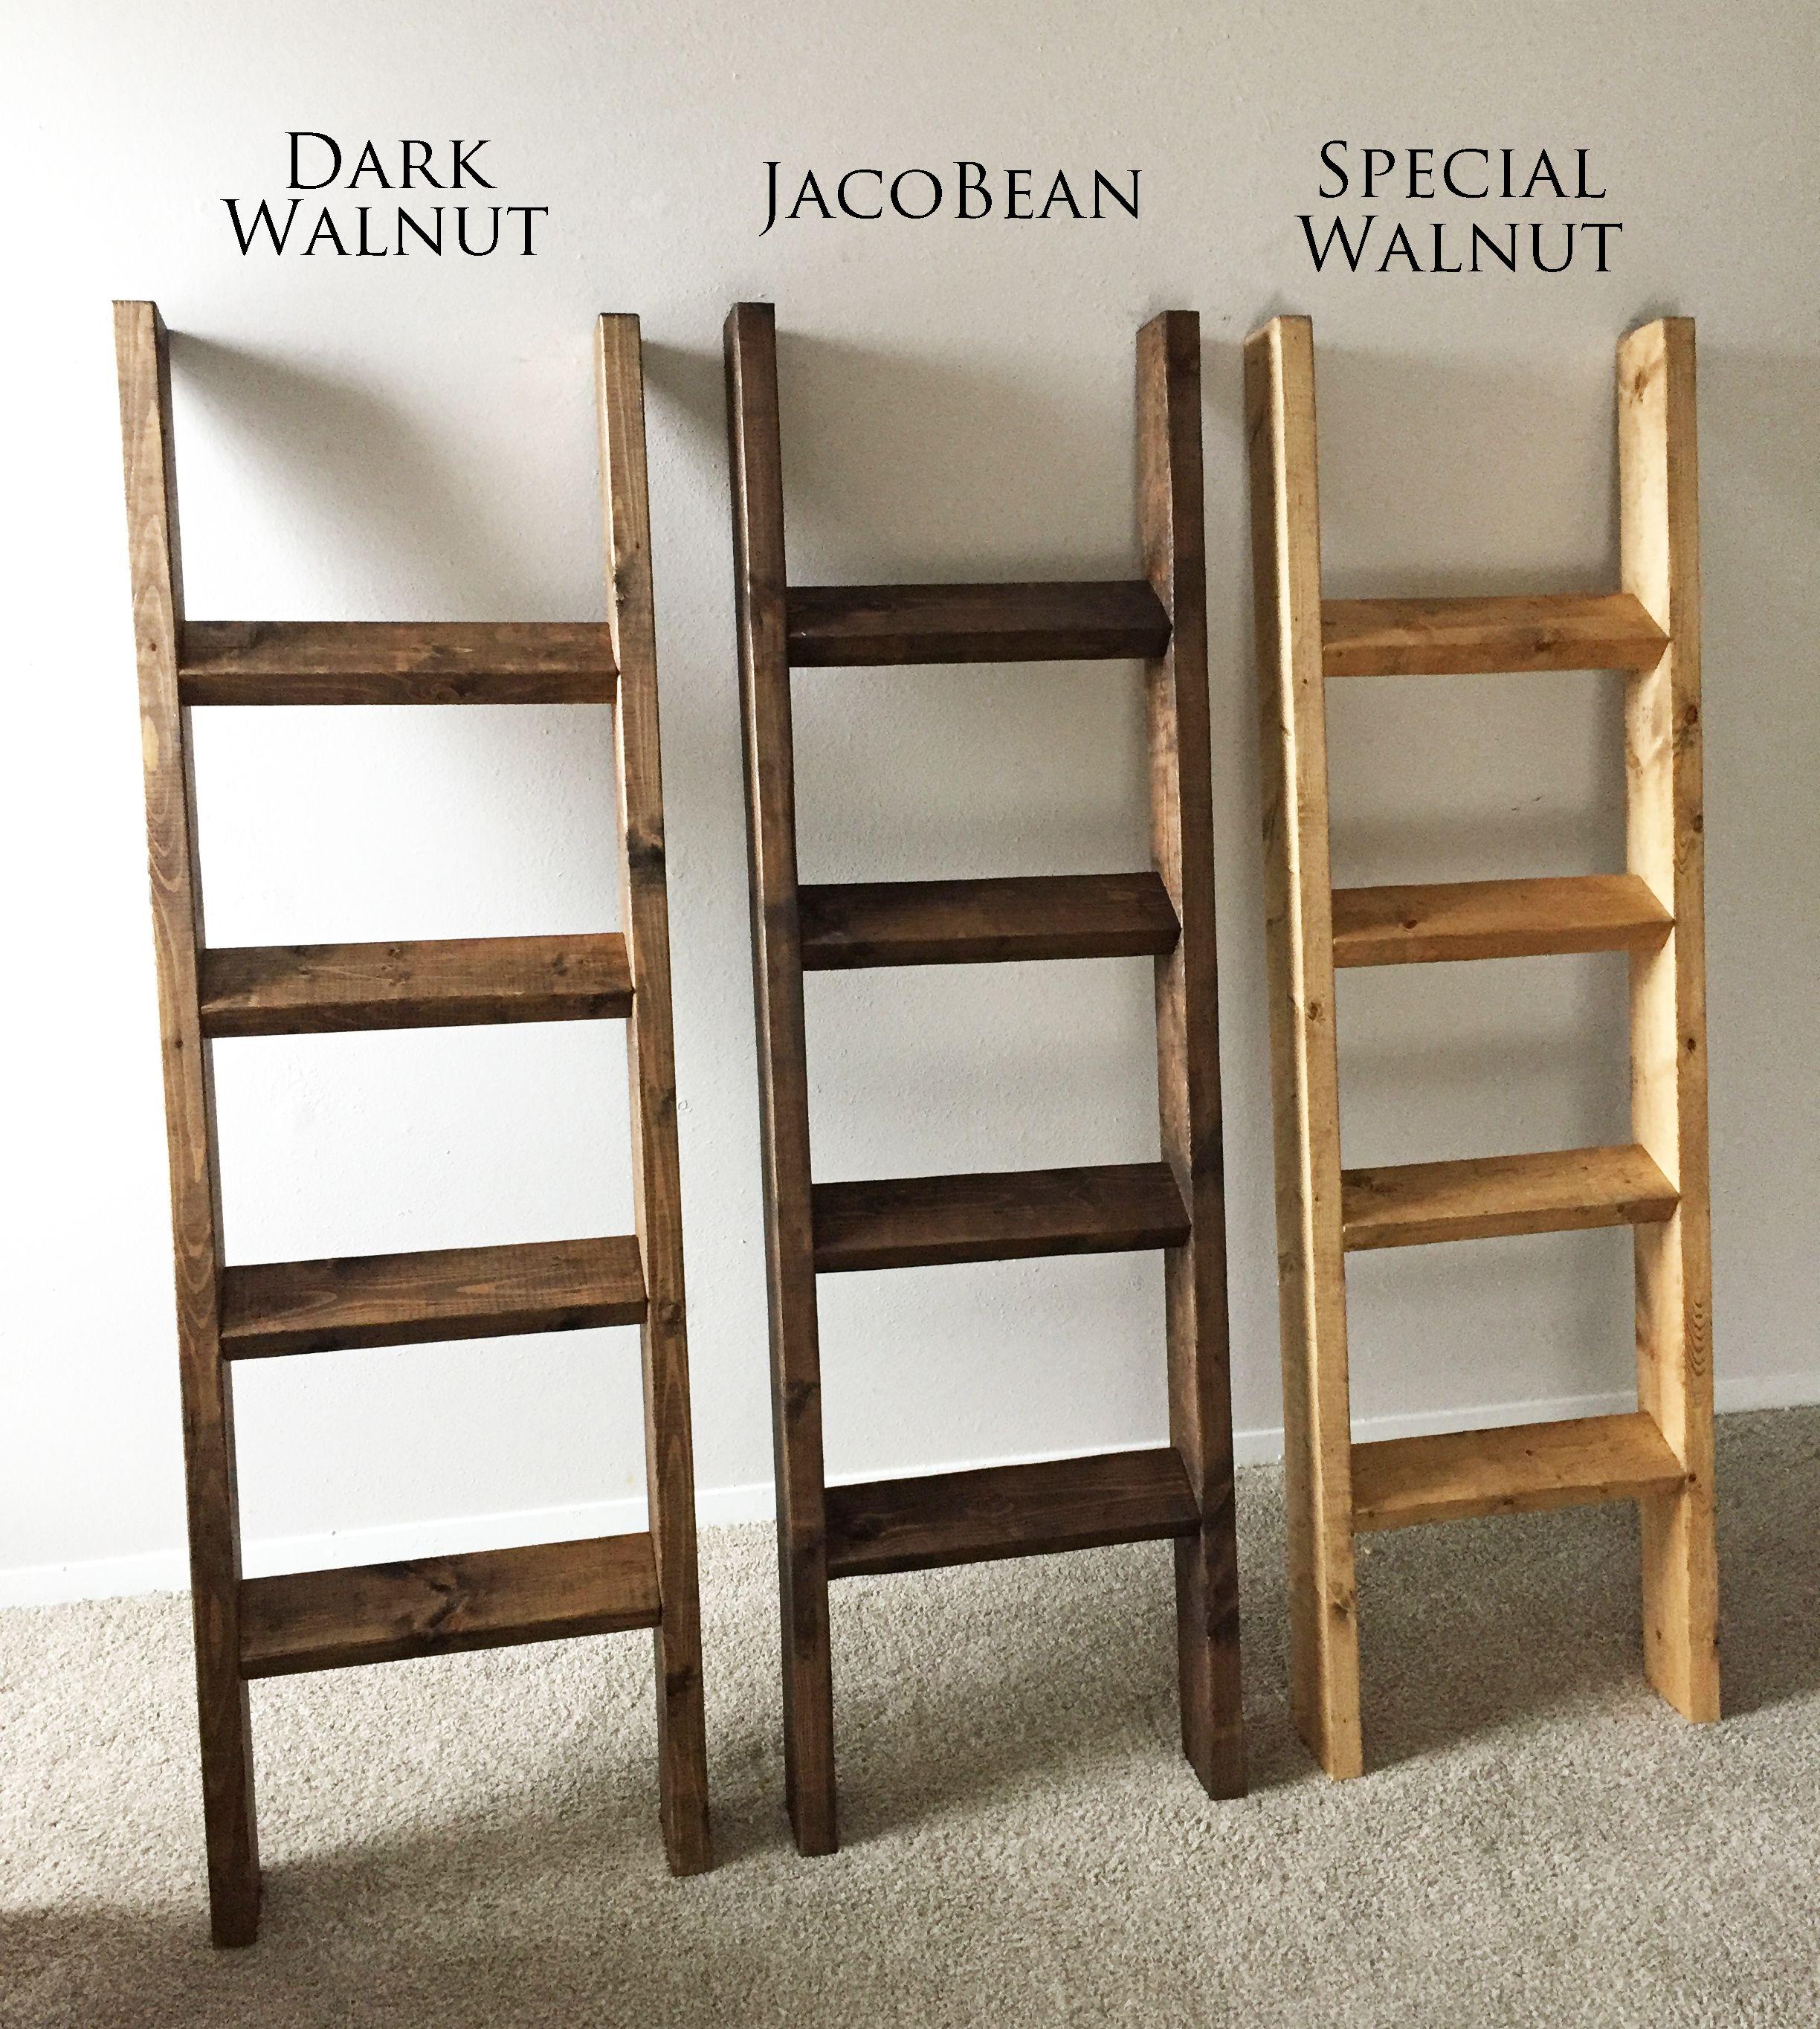 Farmhouse Ladder Blanket Ladder Quilt Ladder Bedroom Etsy Quilt Ladder Blanket Ladder Decor Rustic Blanket Ladder